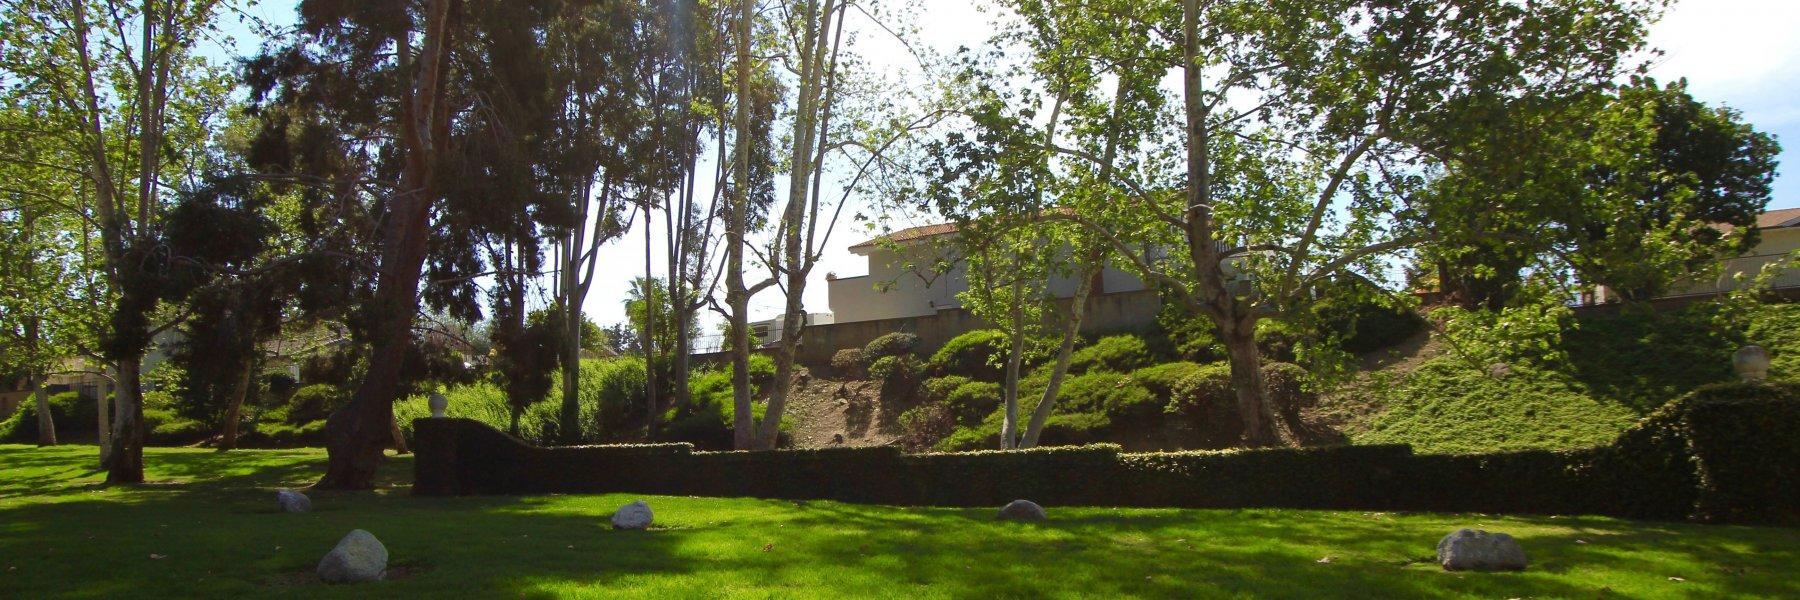 Granada is a community of homes in Mission Viejo California